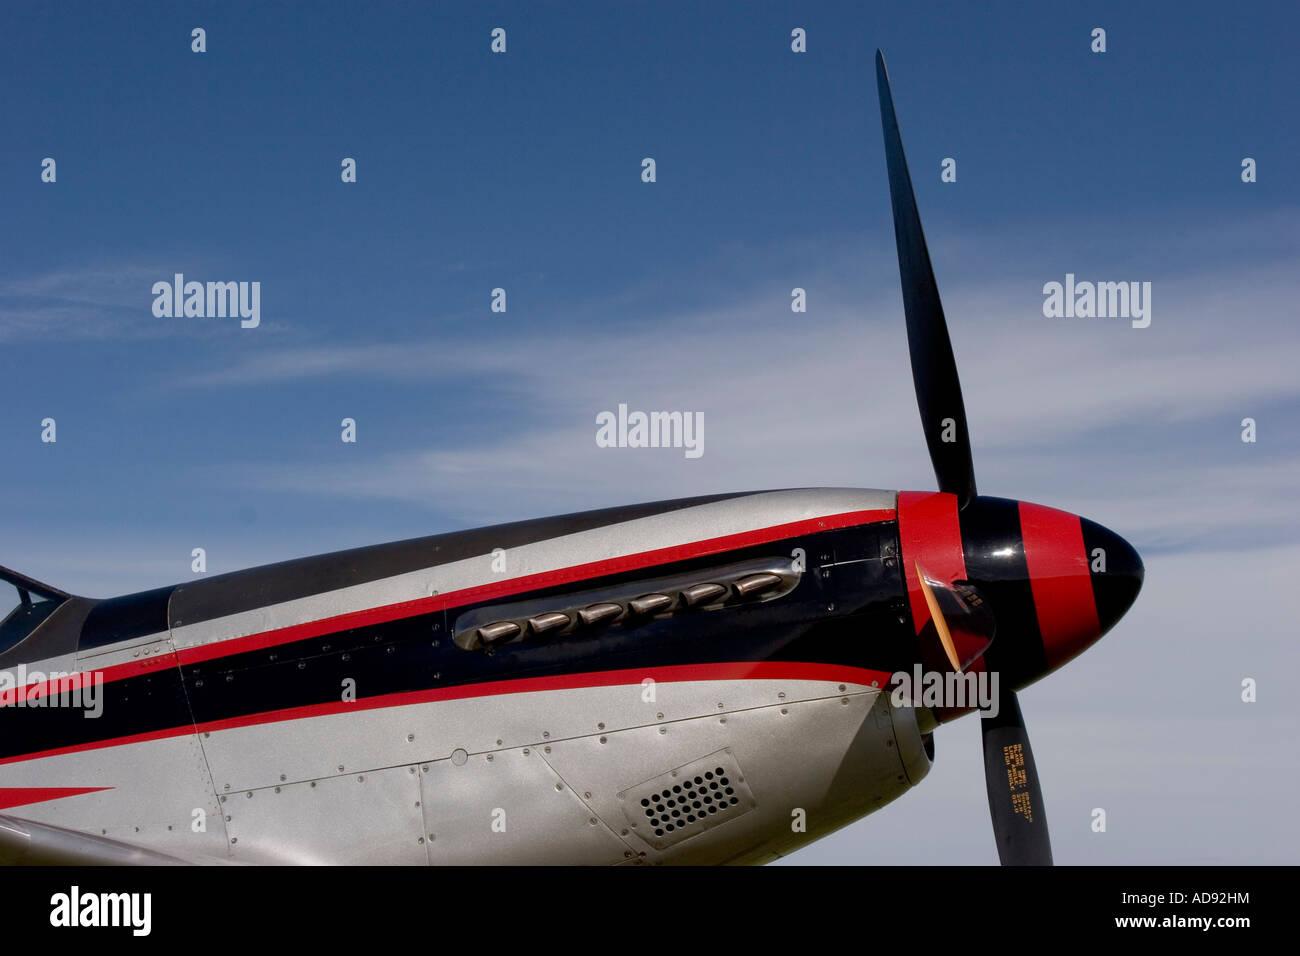 P 51D Mustang - Stock Image